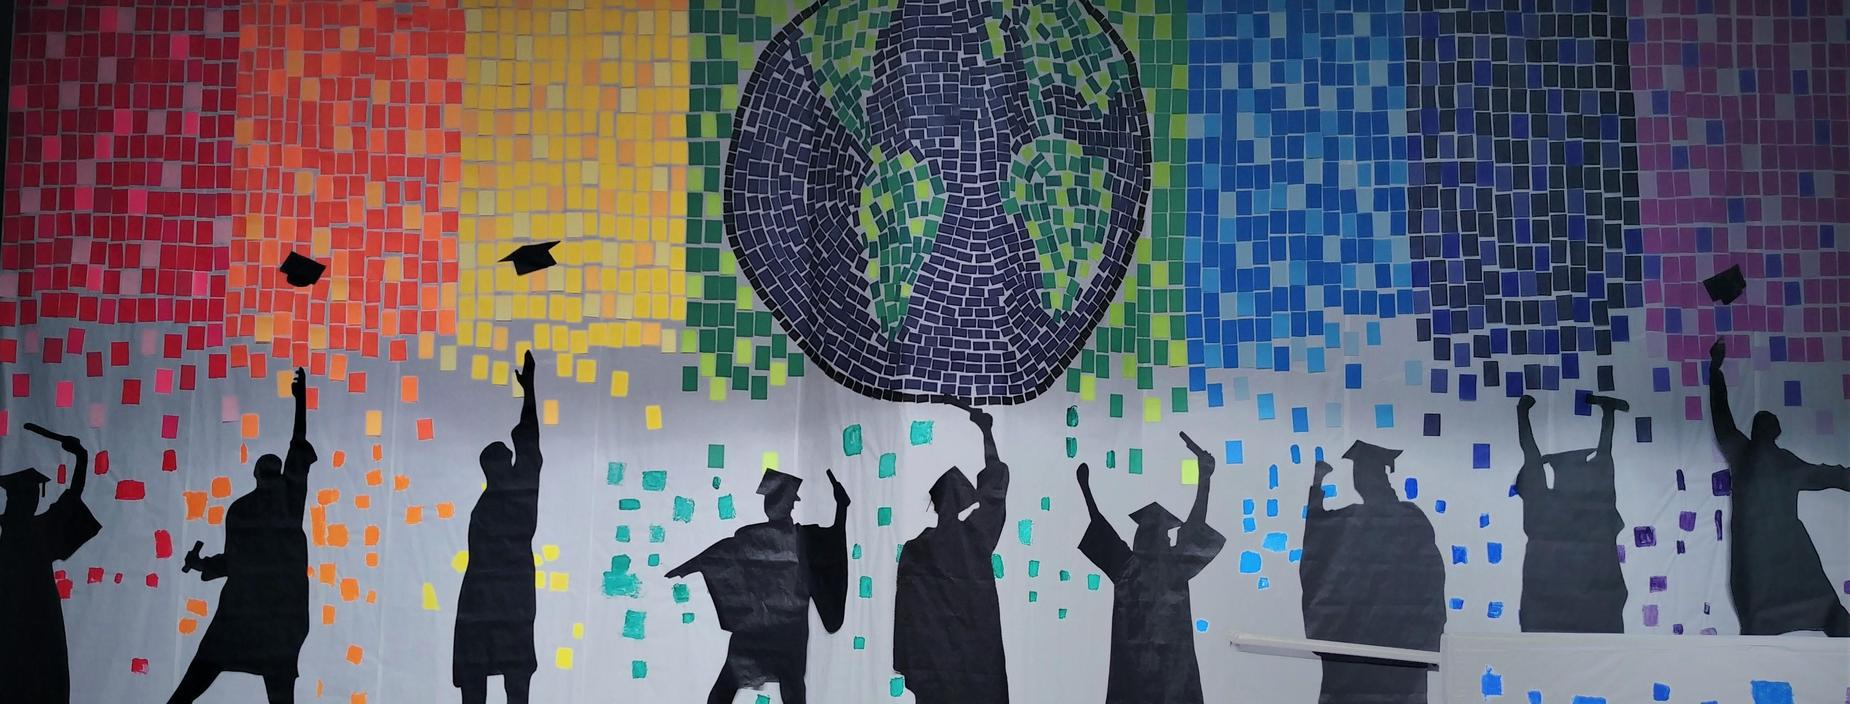 Rainbow mosaic of graduate silhouettes under the world.